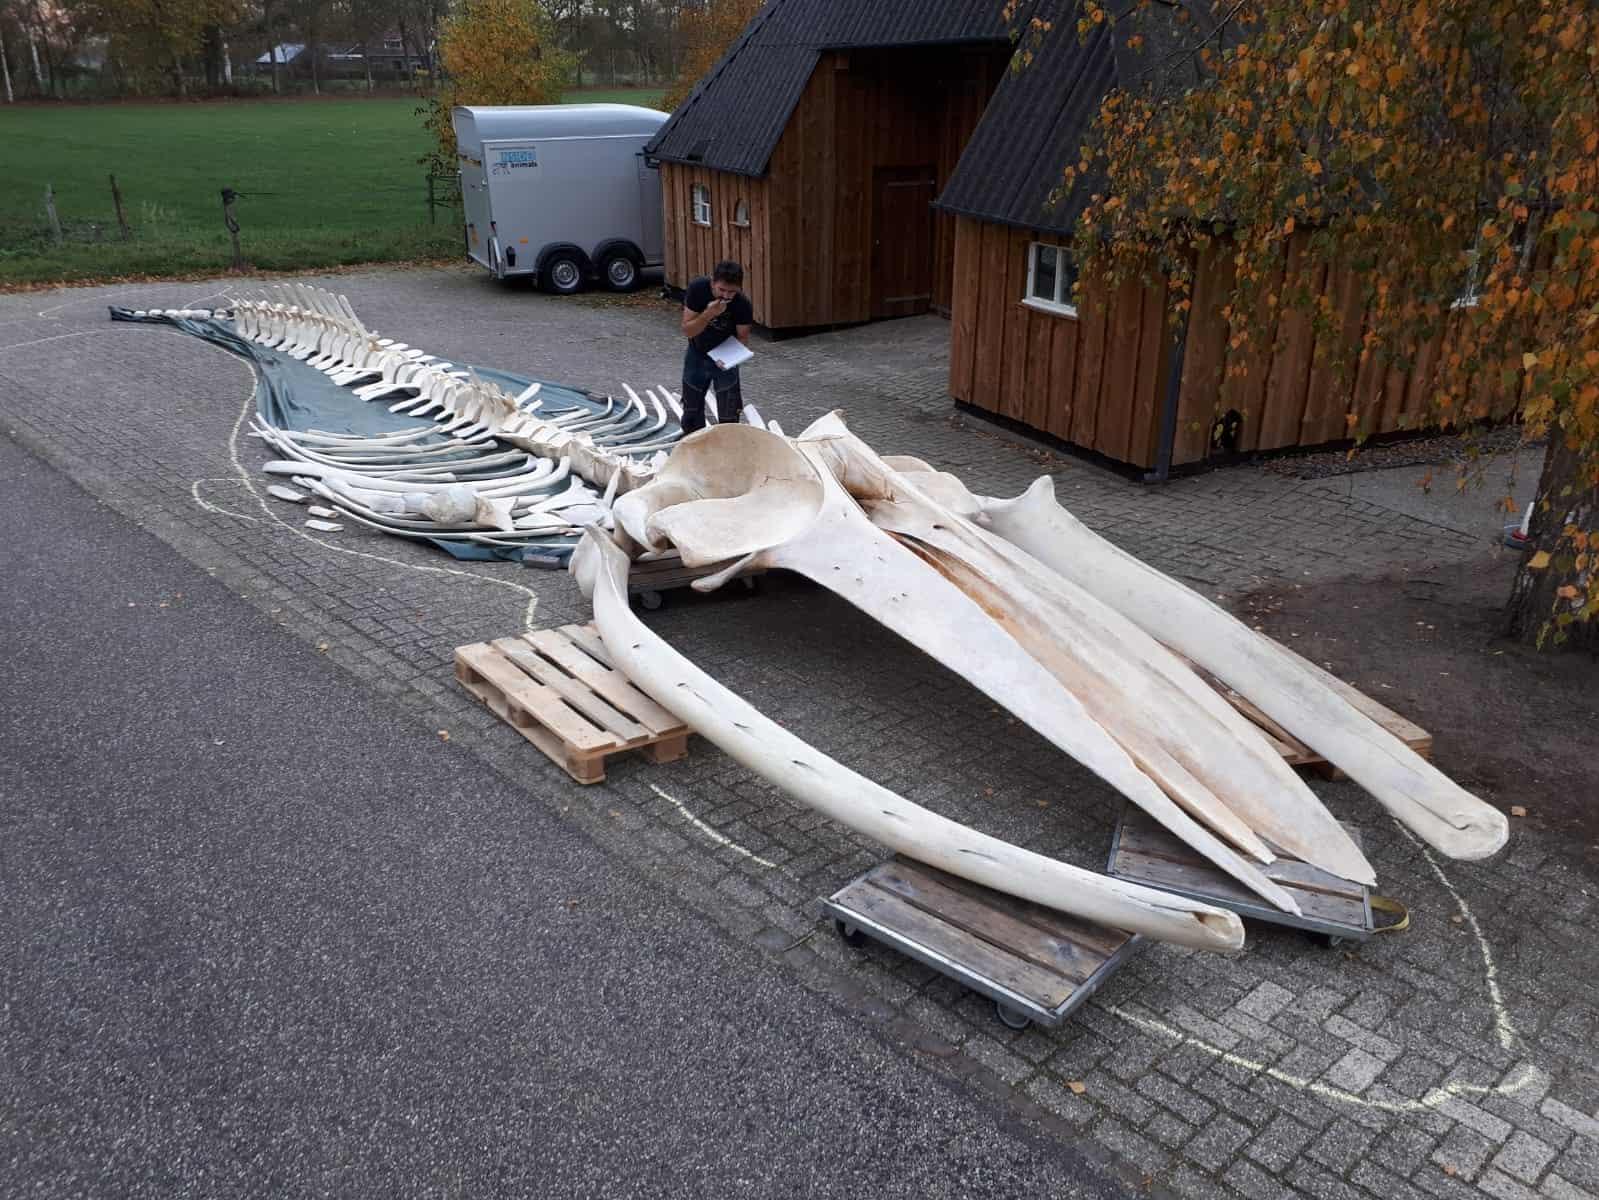 Skeletten | gewone vinvis 17,5 meter | Naturalis Biodiversity Center